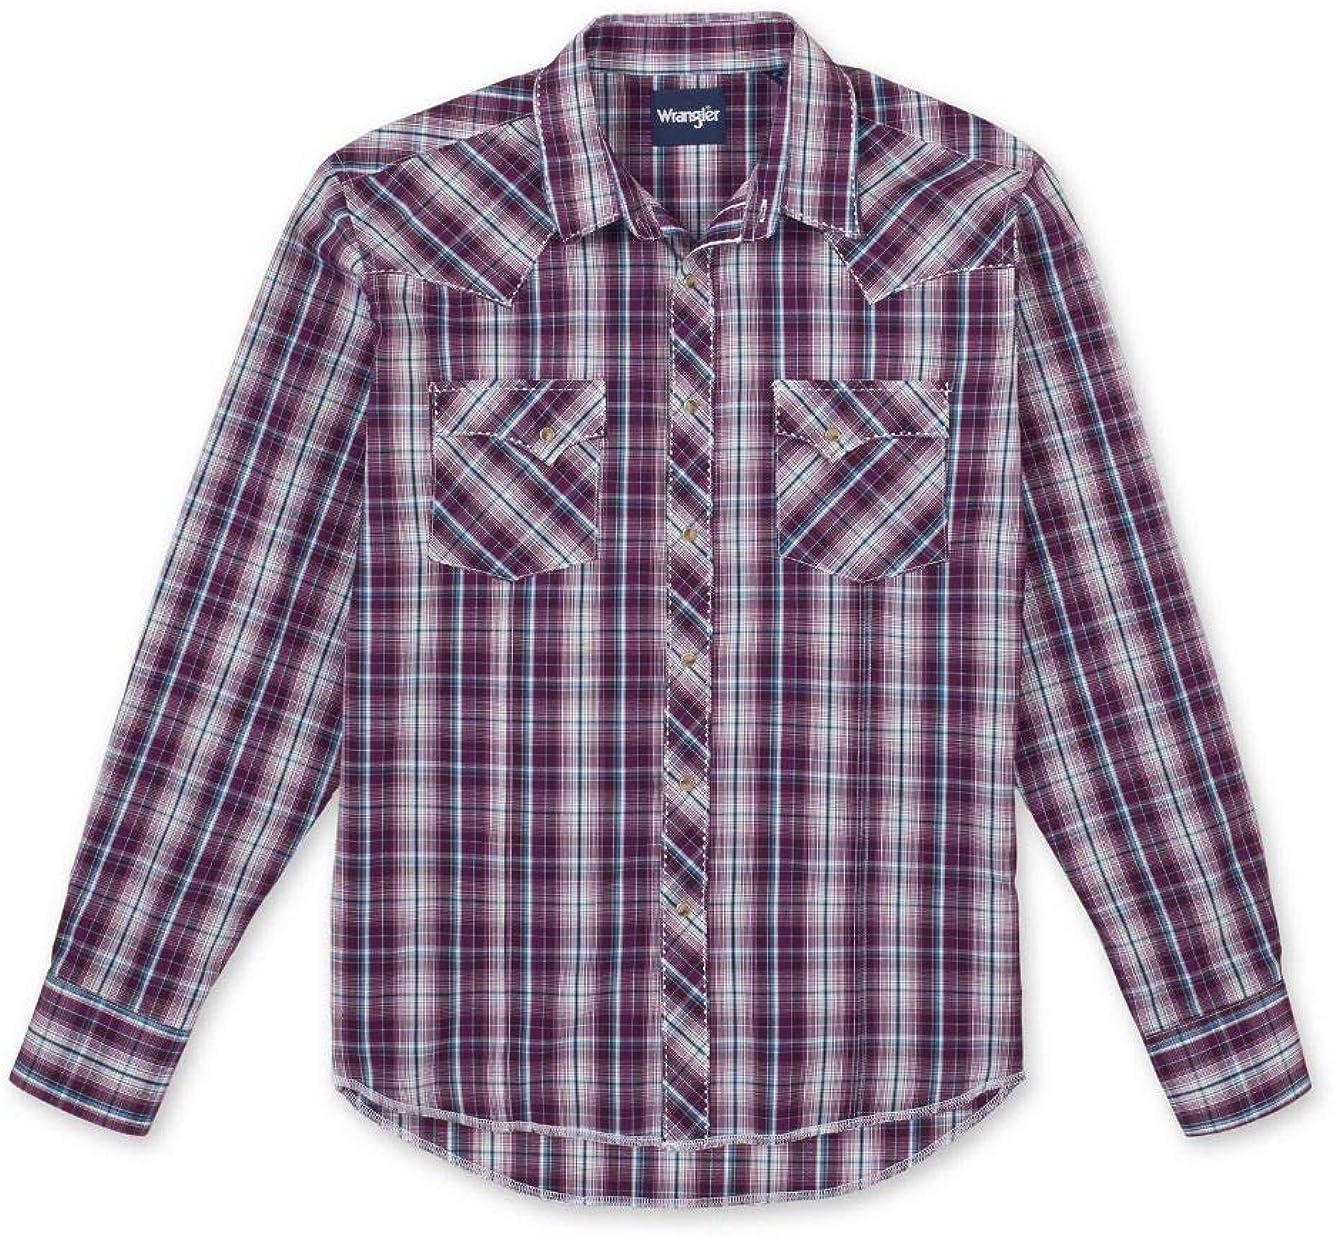 Wrangler Men's Western Fashion Two Pocket Long Sleeve Snap